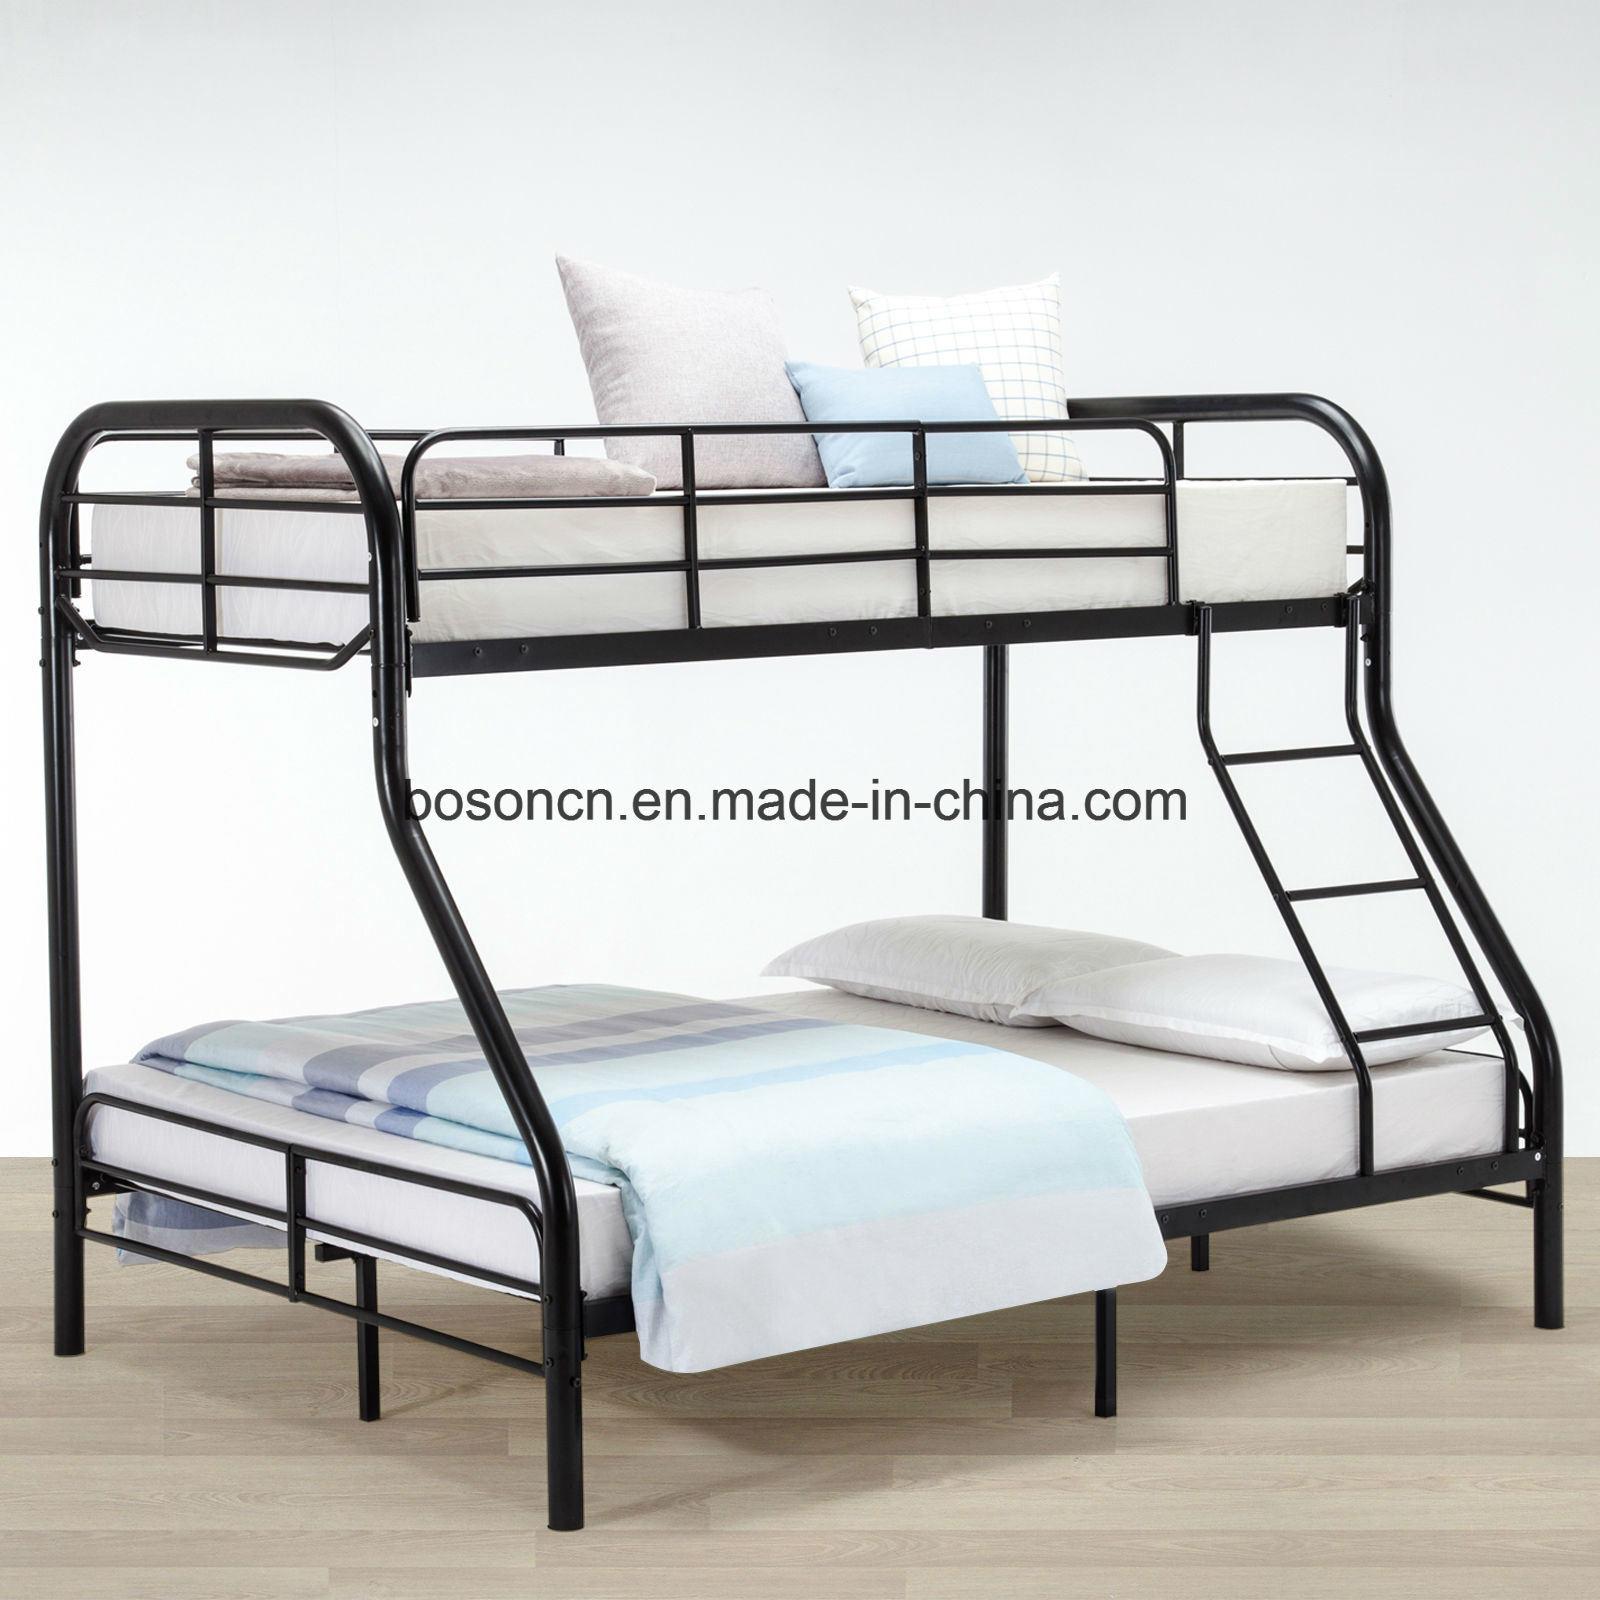 China Hot Sale Bedroom Metal Bunk Bed China Metal Bunk Bed Frame Metal Double Bed